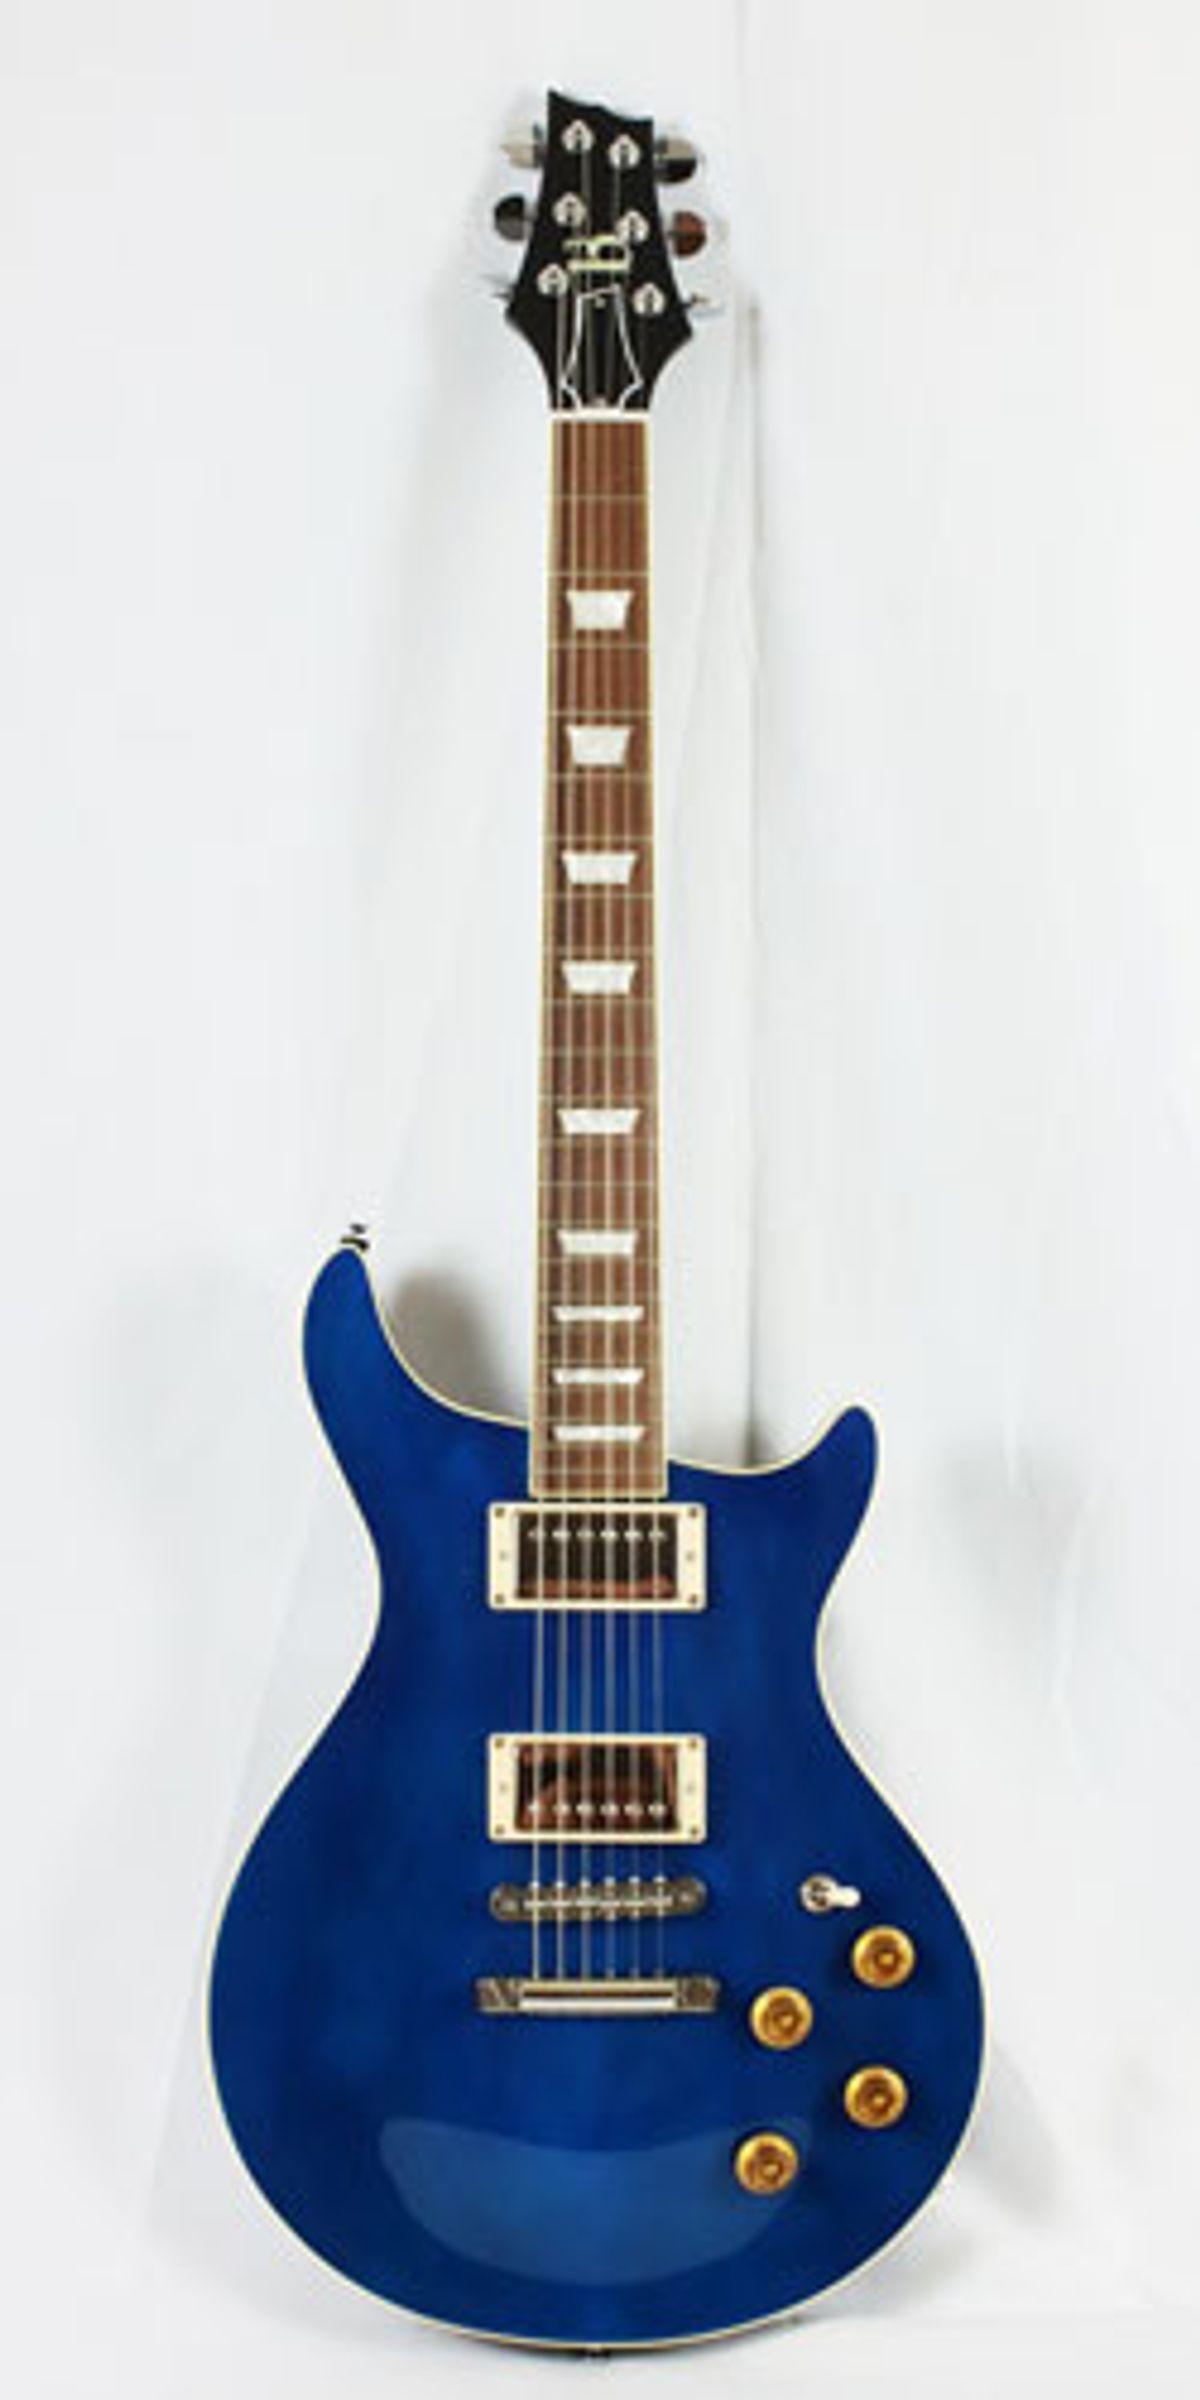 b3 Guitars Introduces the SL-K